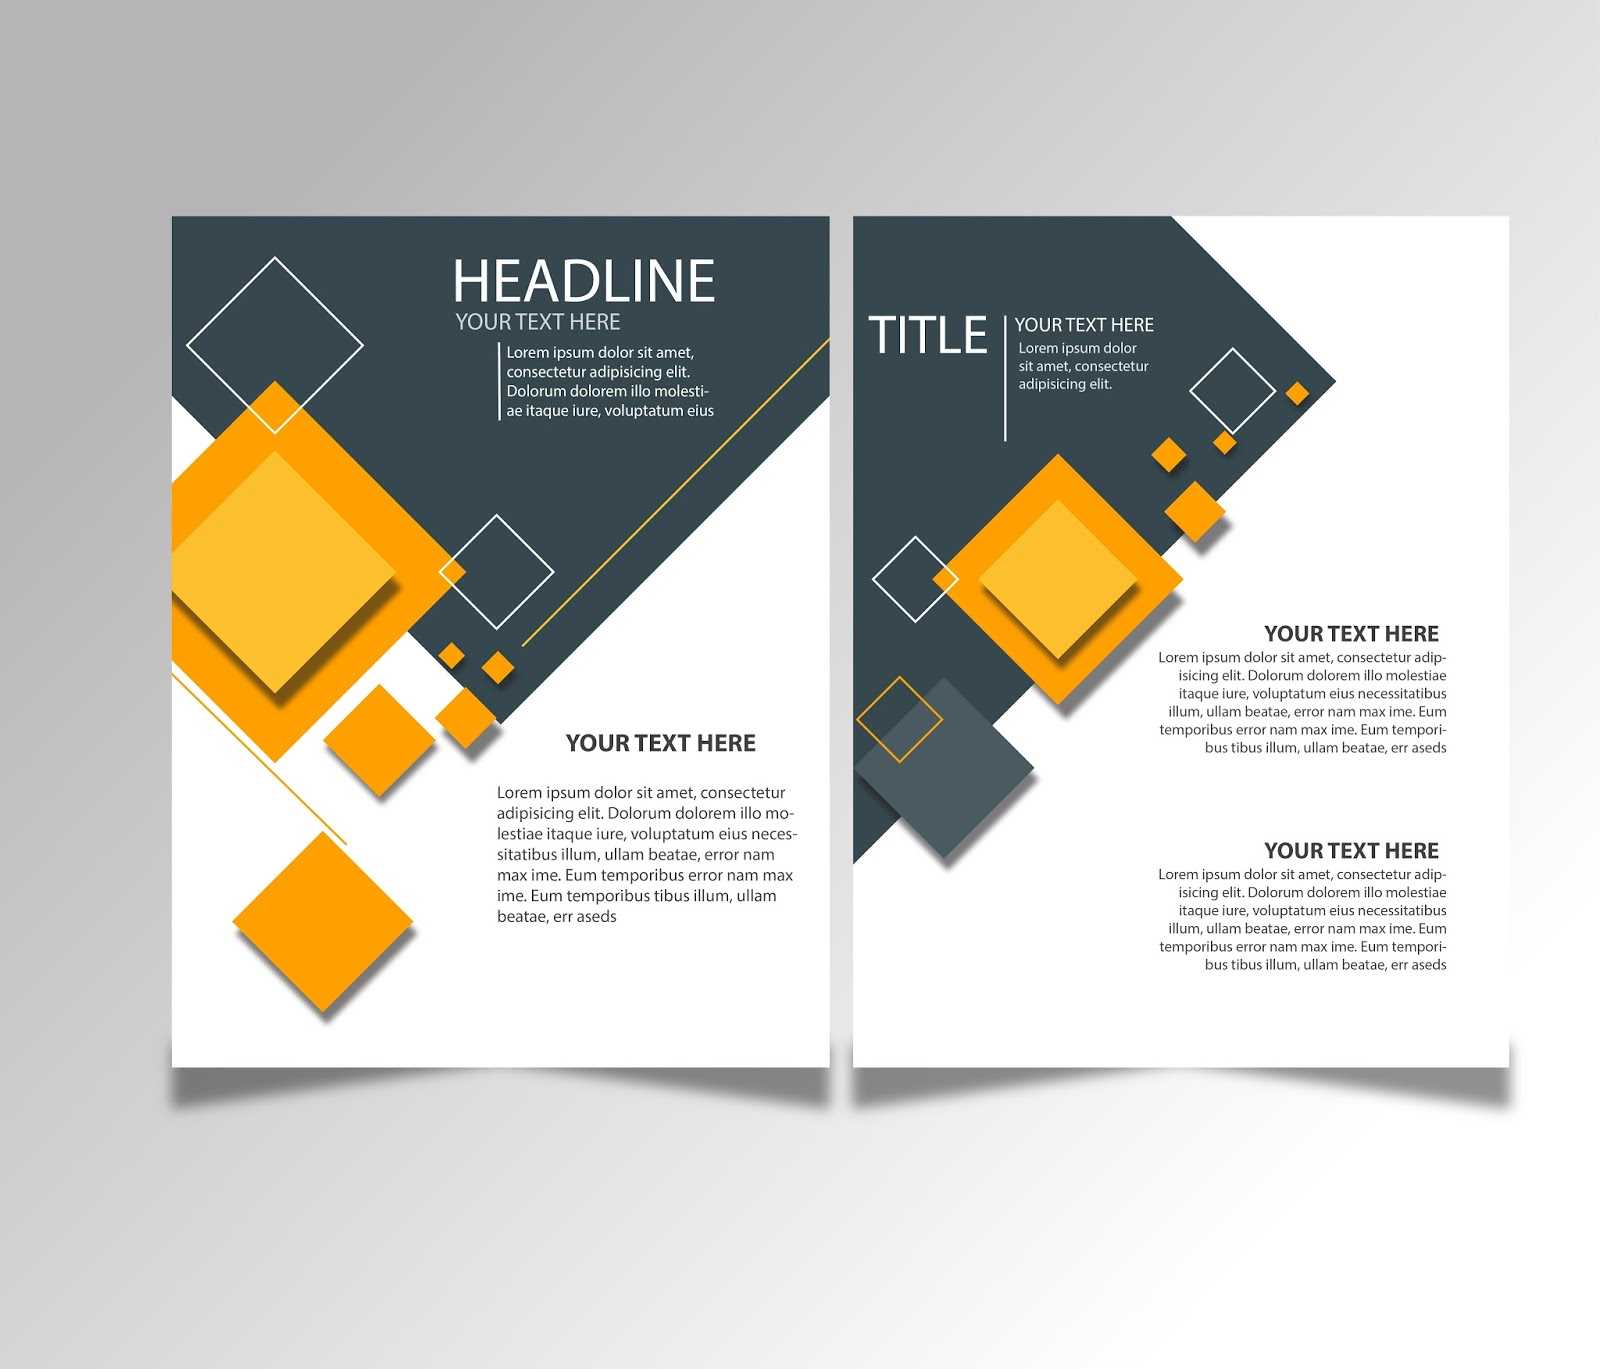 Free Download Brochure Design Templates Ai Files - Ideosprocess Inside Brochure Templates Ai Free Download